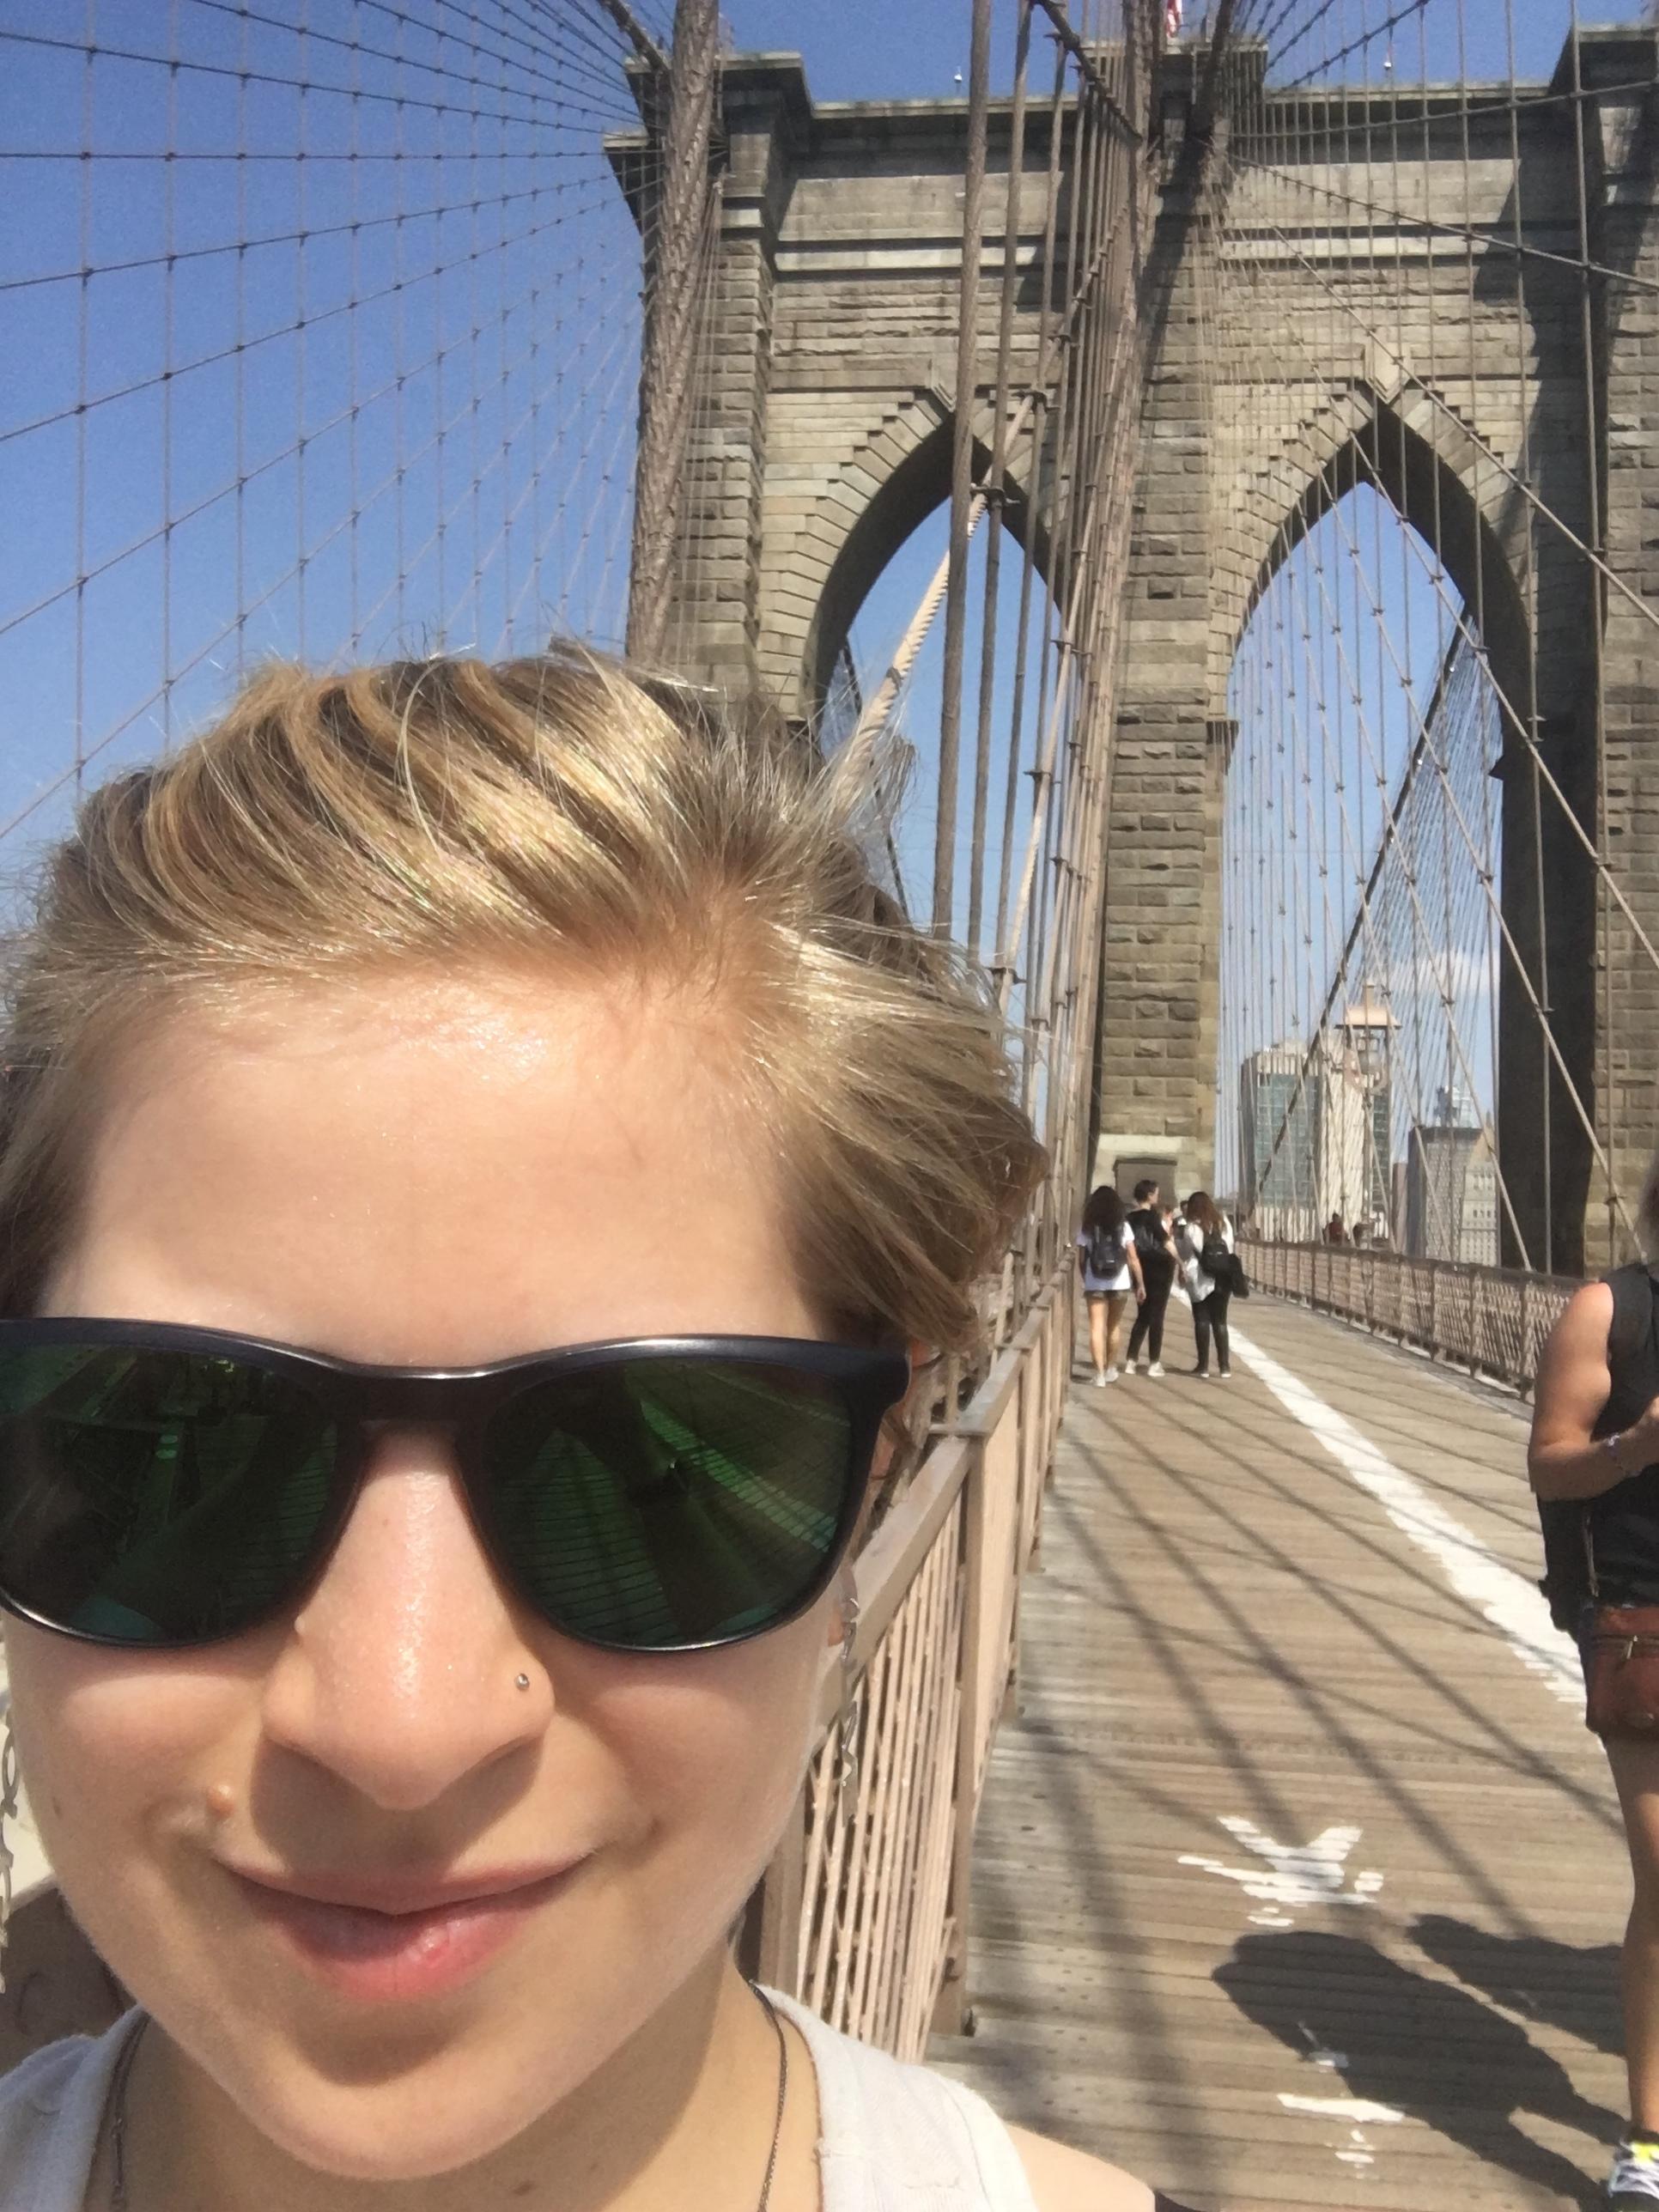 Oh look! It's the Brooklyn Bridge